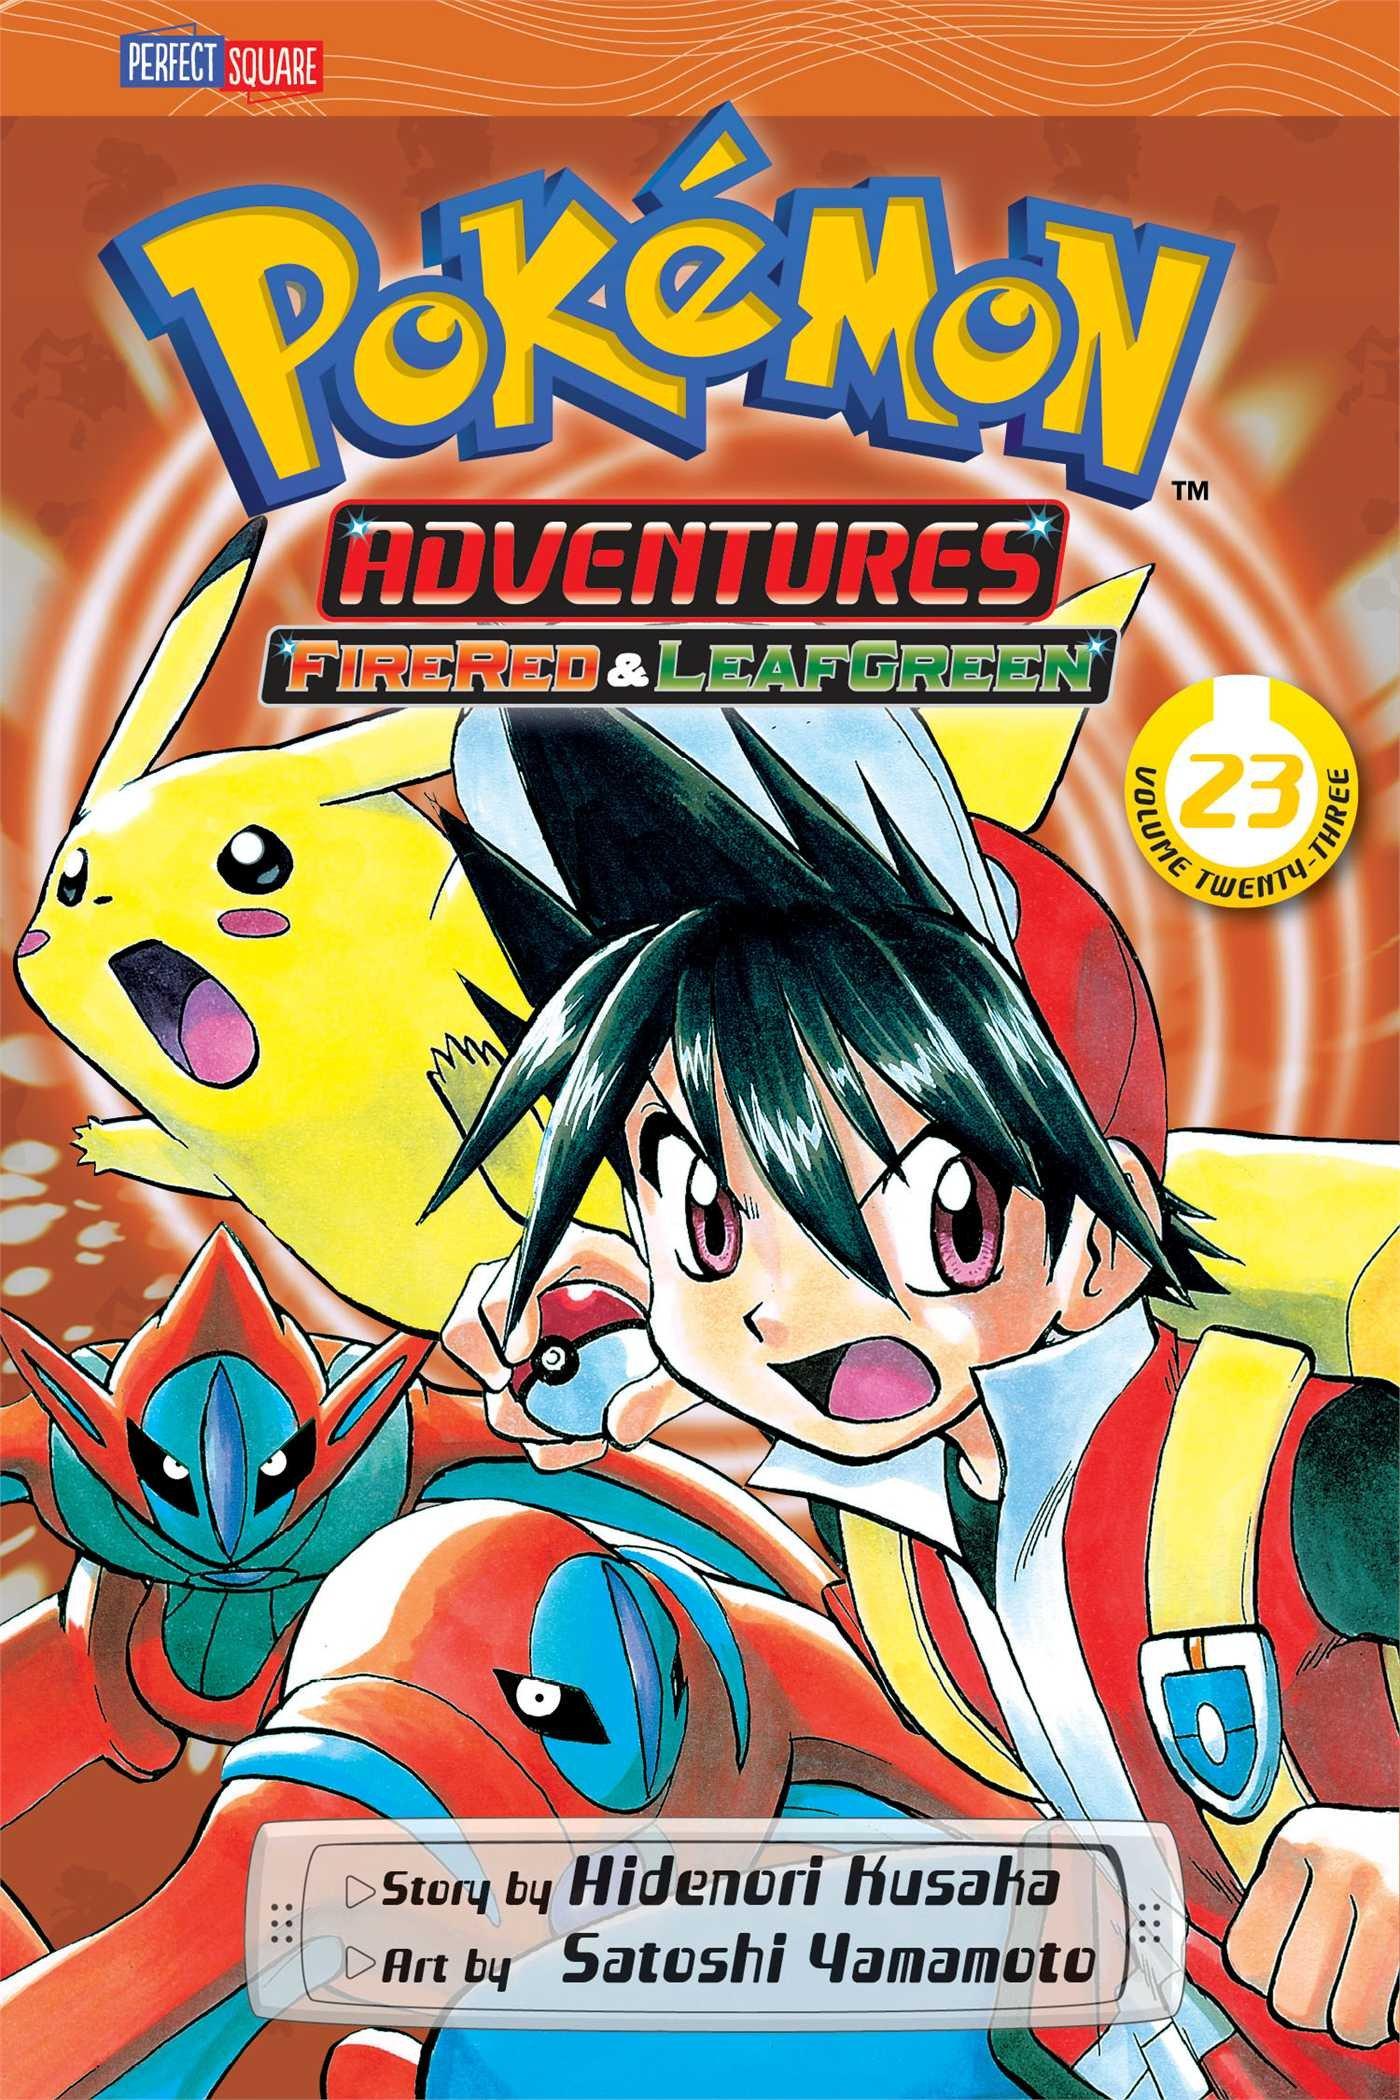 Pok%C3%A9mon Adventures Vol 23 Pokemon product image